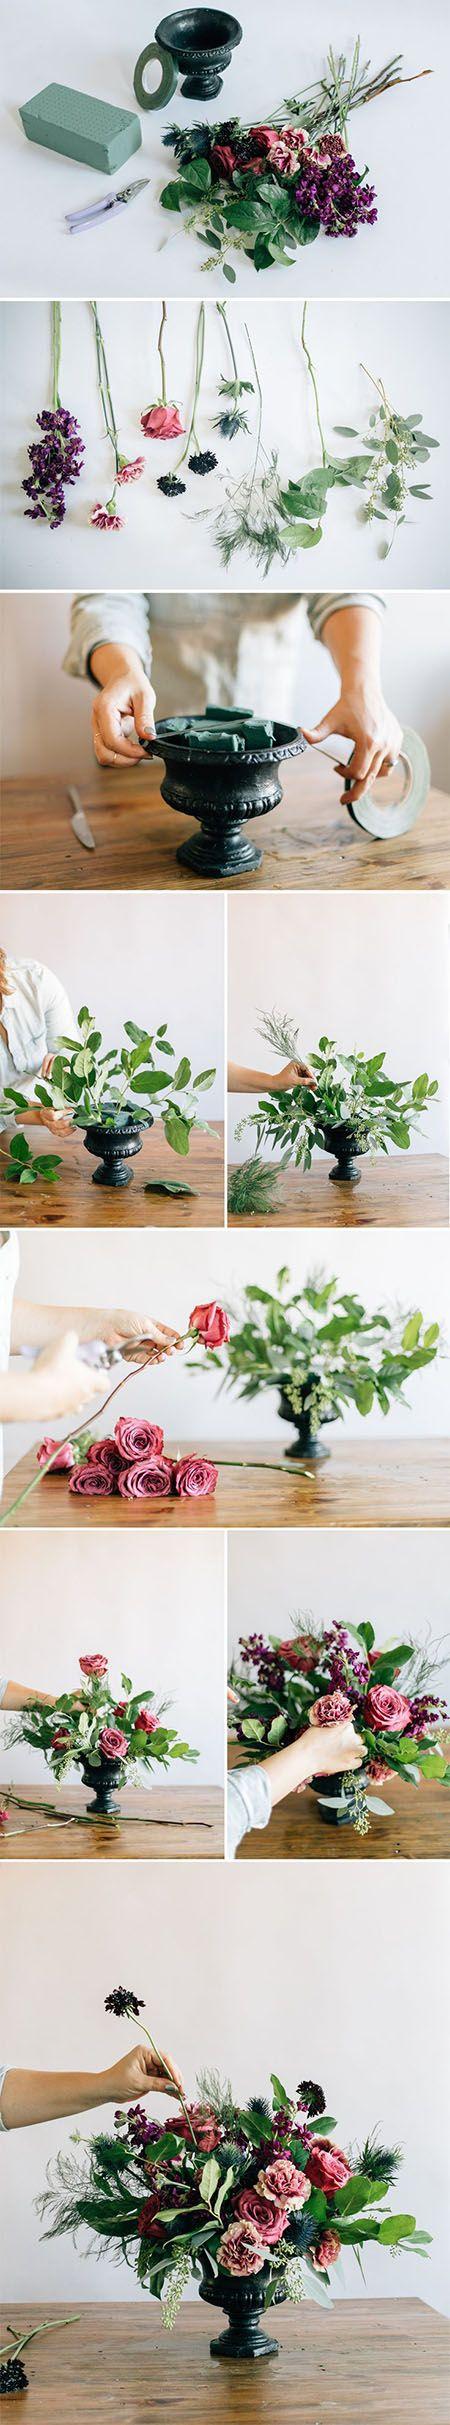 how to make flowers arrangement